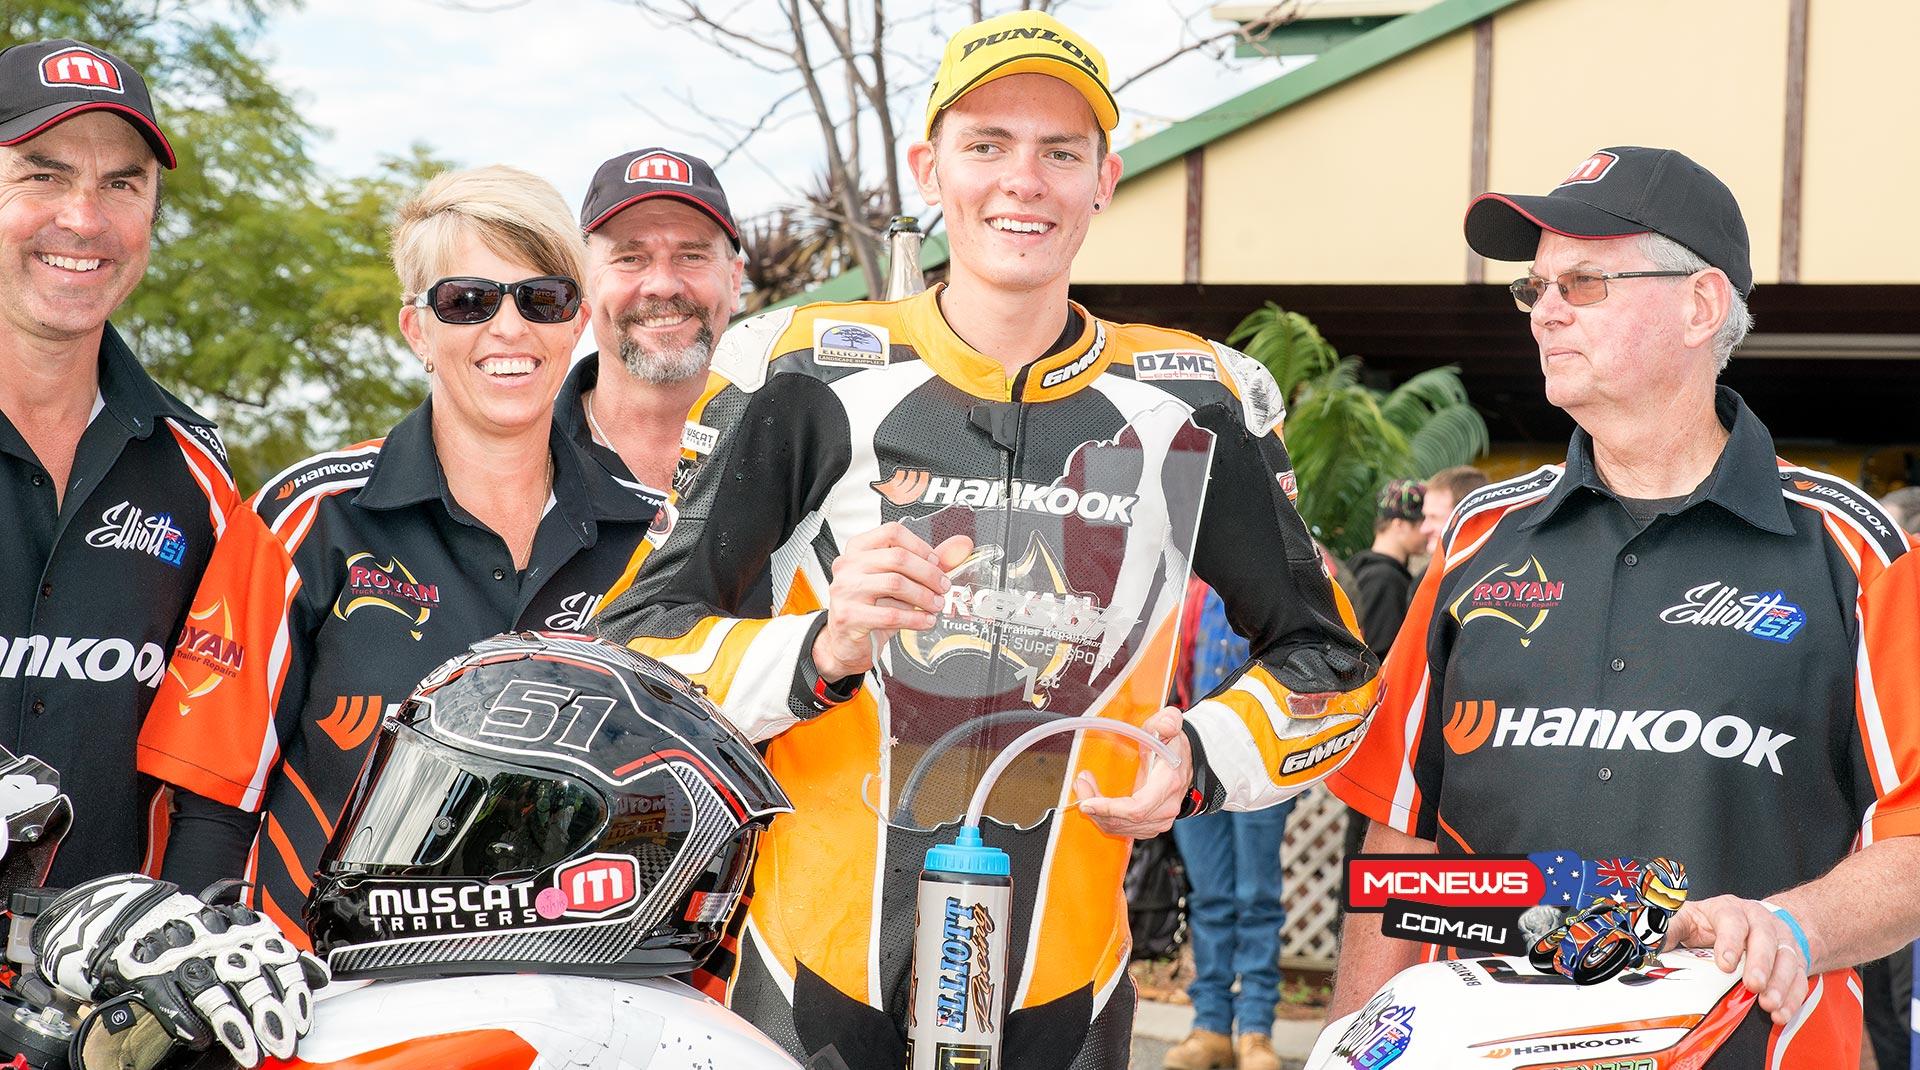 Brayden Elliott - ASBK 2015 Wanneroo Raceway Supersport Overall Winner 1-1